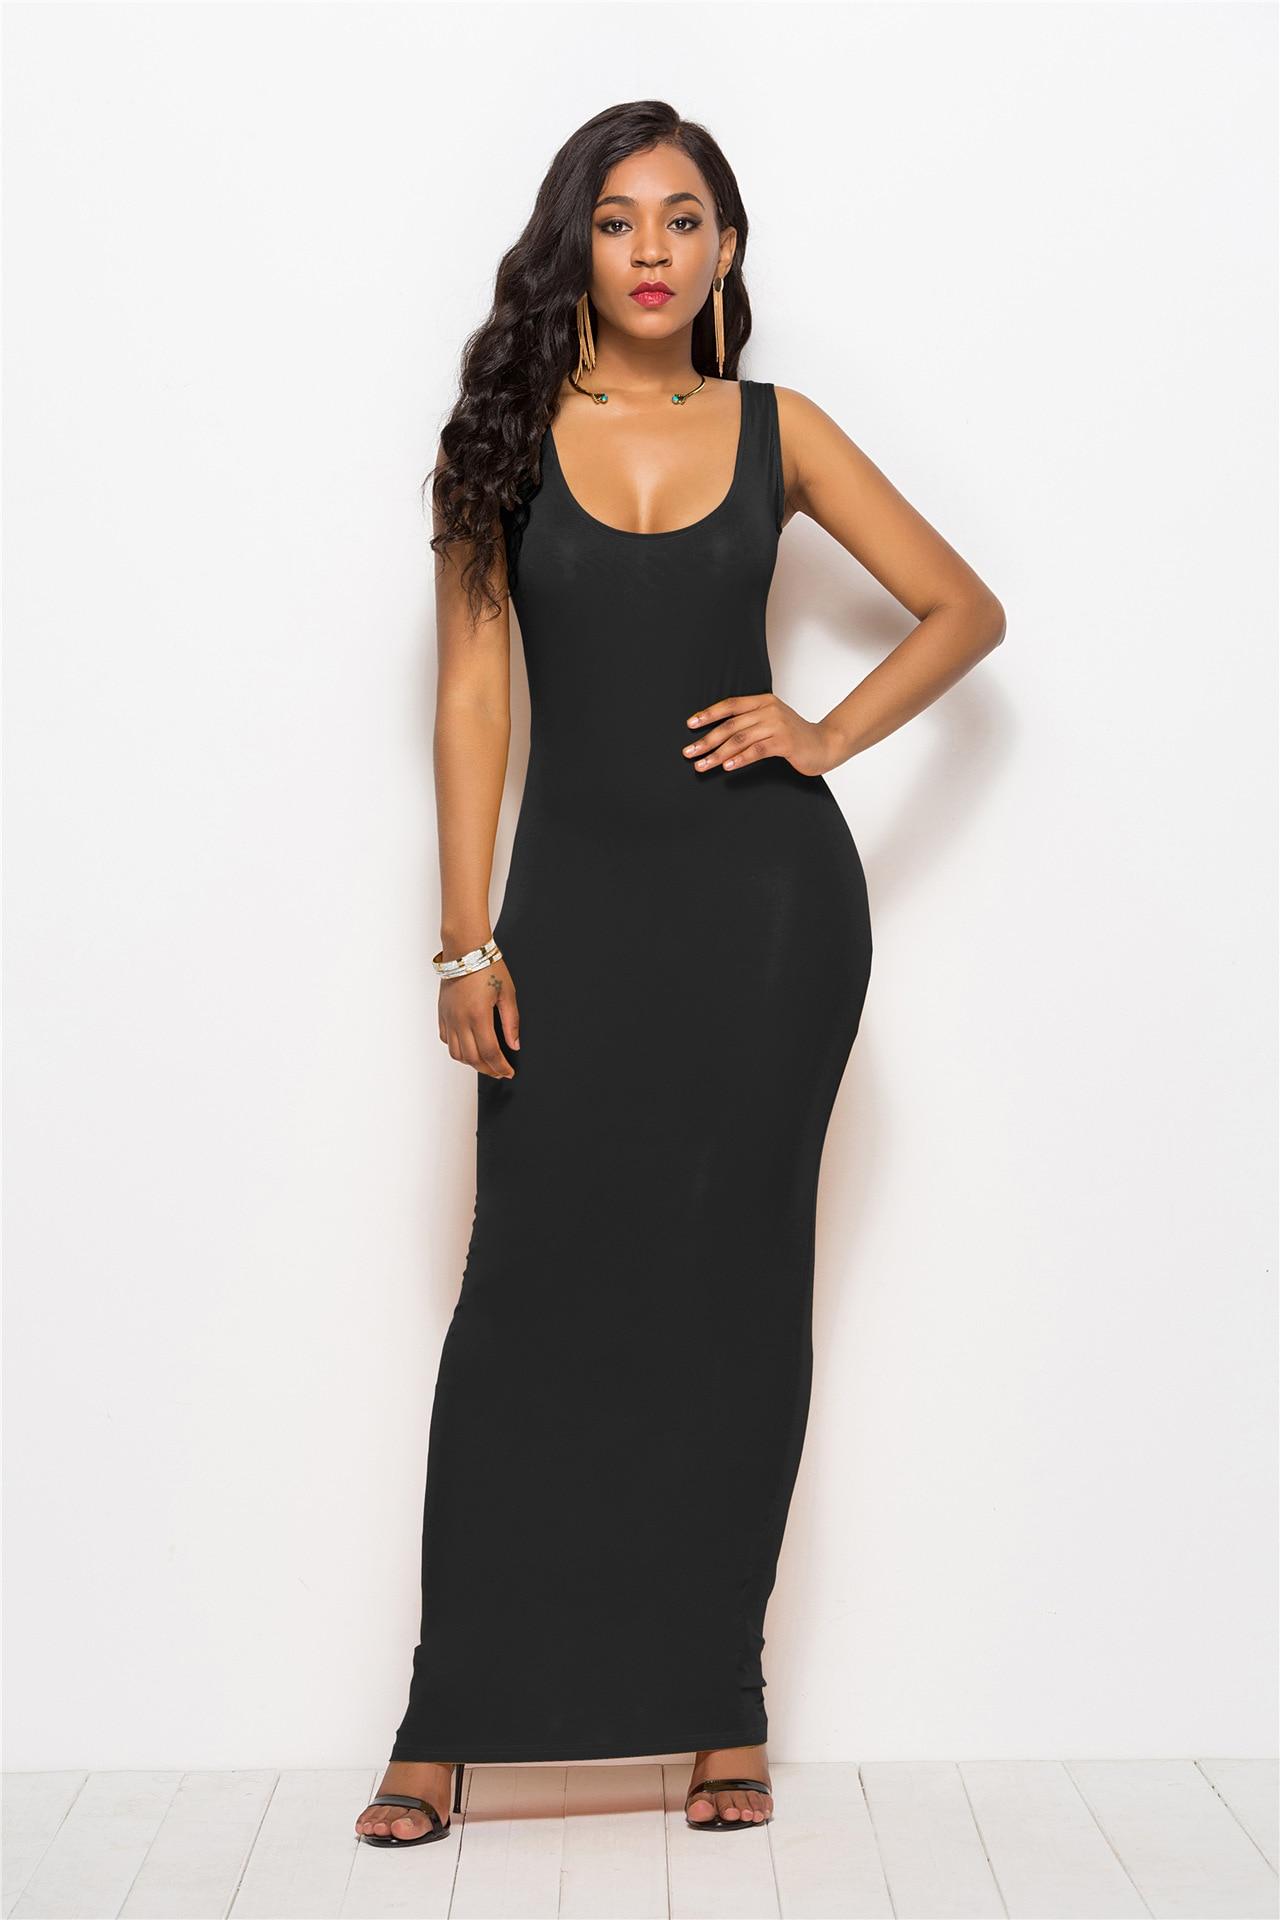 Women's Sexy Vest Long Dress Classic Fashion Elastic Dress